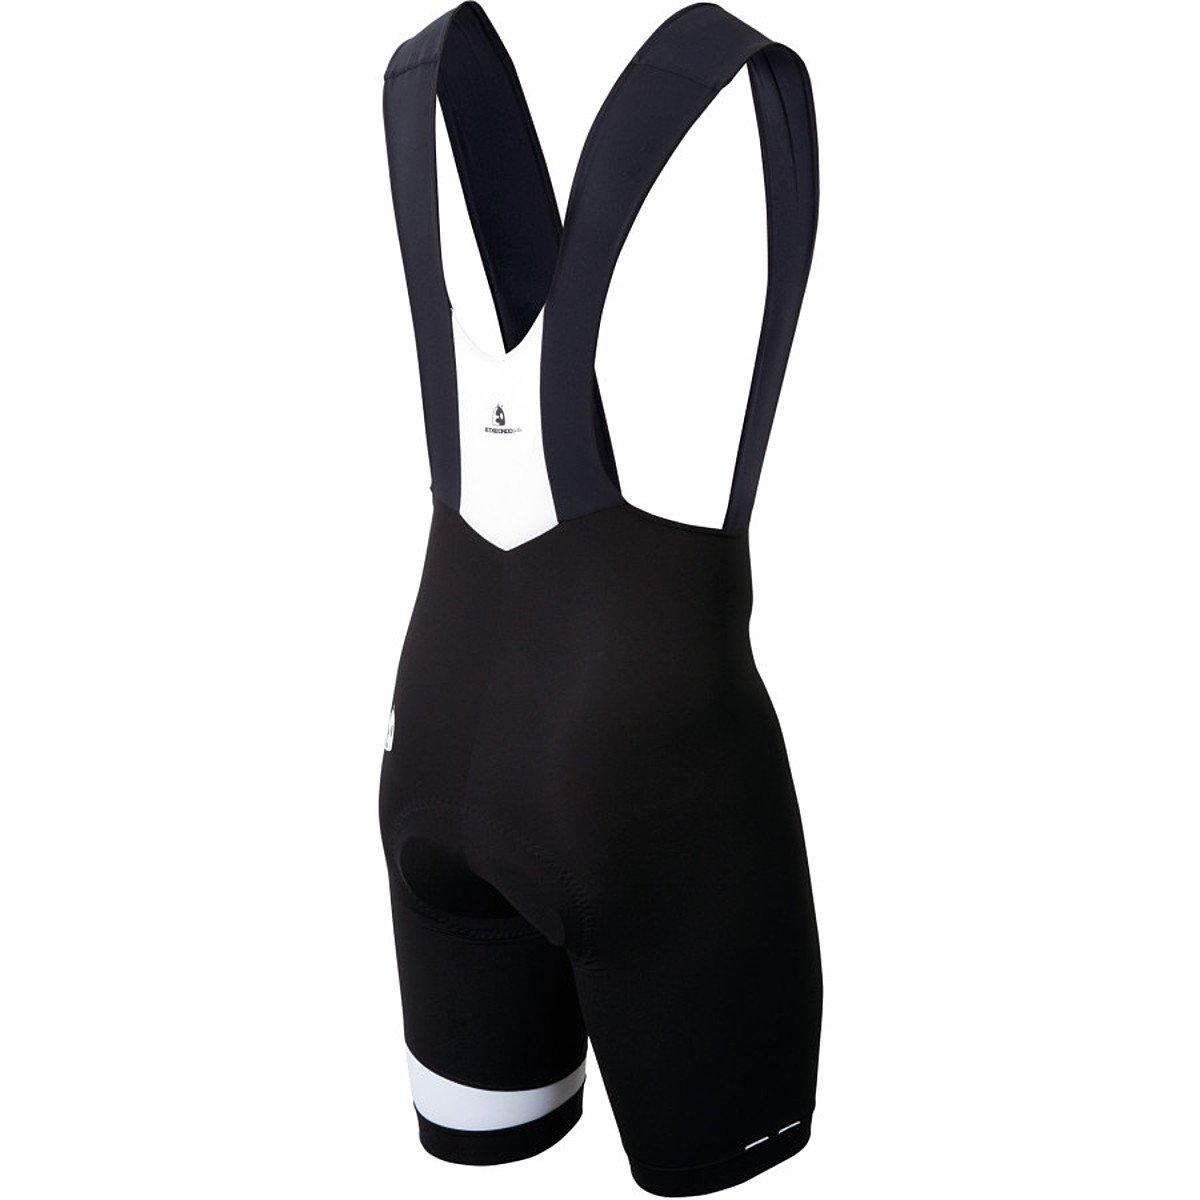 Etxeondo Feather Men s Bib Shorts -  Amazon.co.uk  Sports   Outdoors ce1e713d4